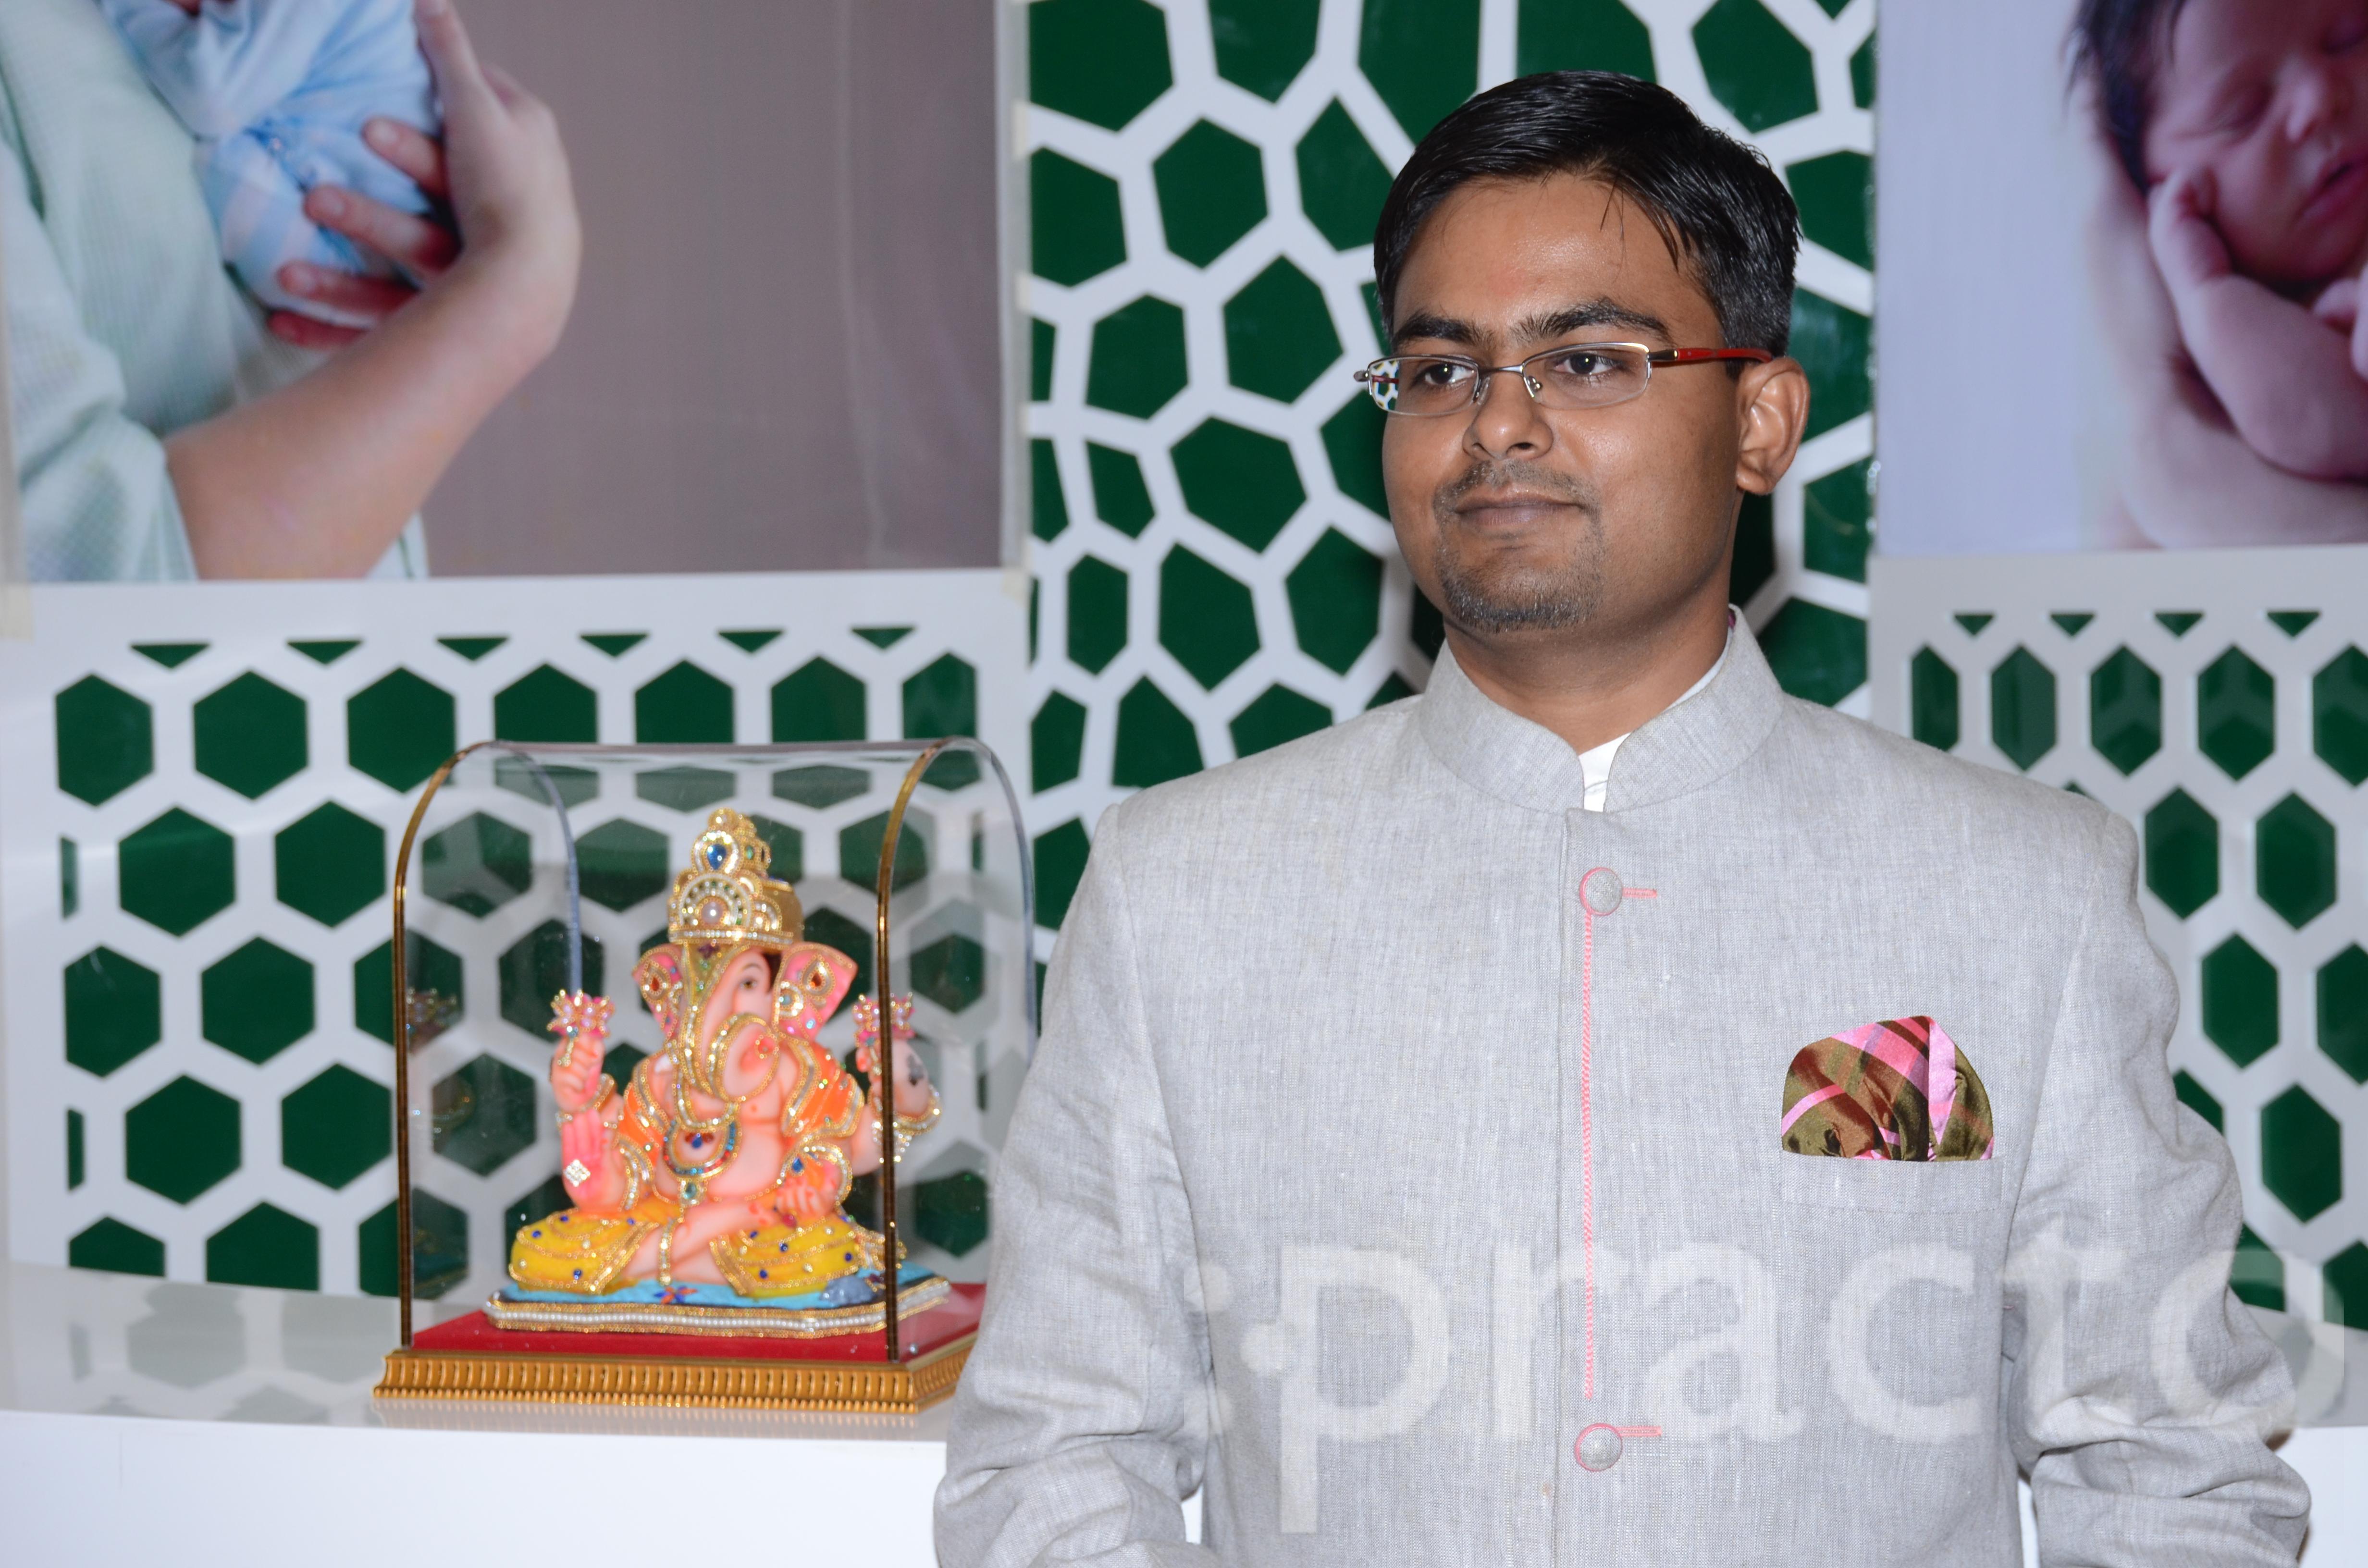 Dr. Prashant - Pediatrician